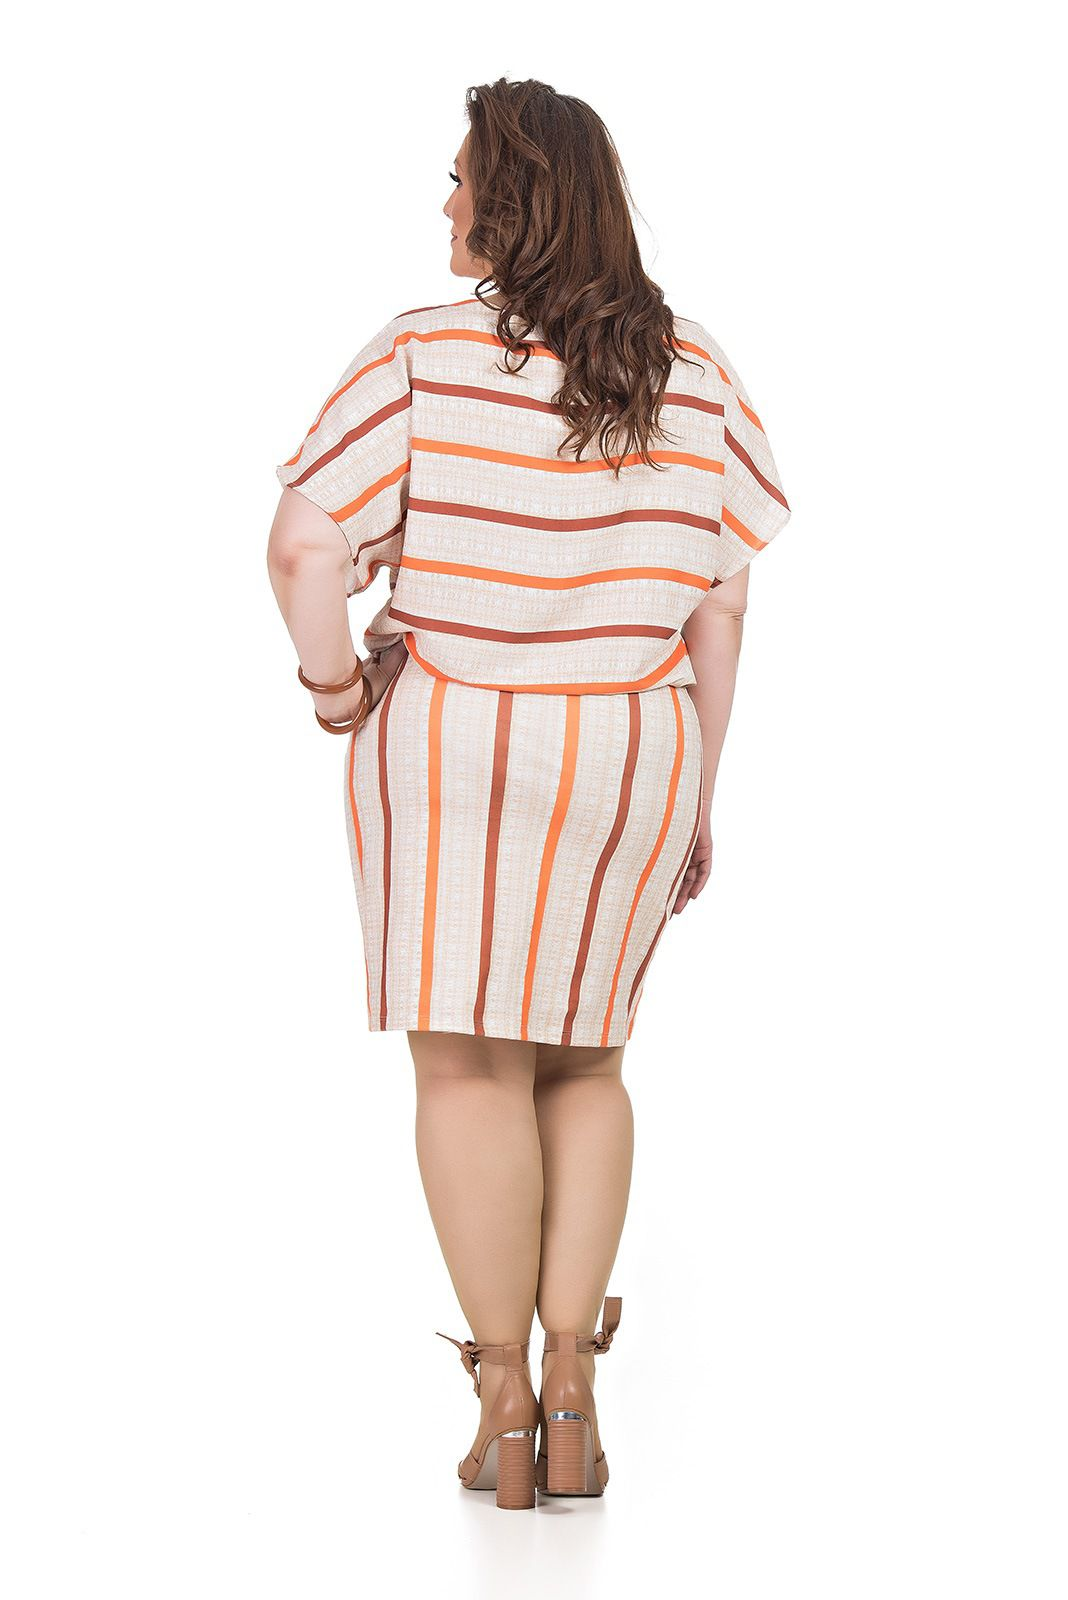 Vestido Bluse malha em plano